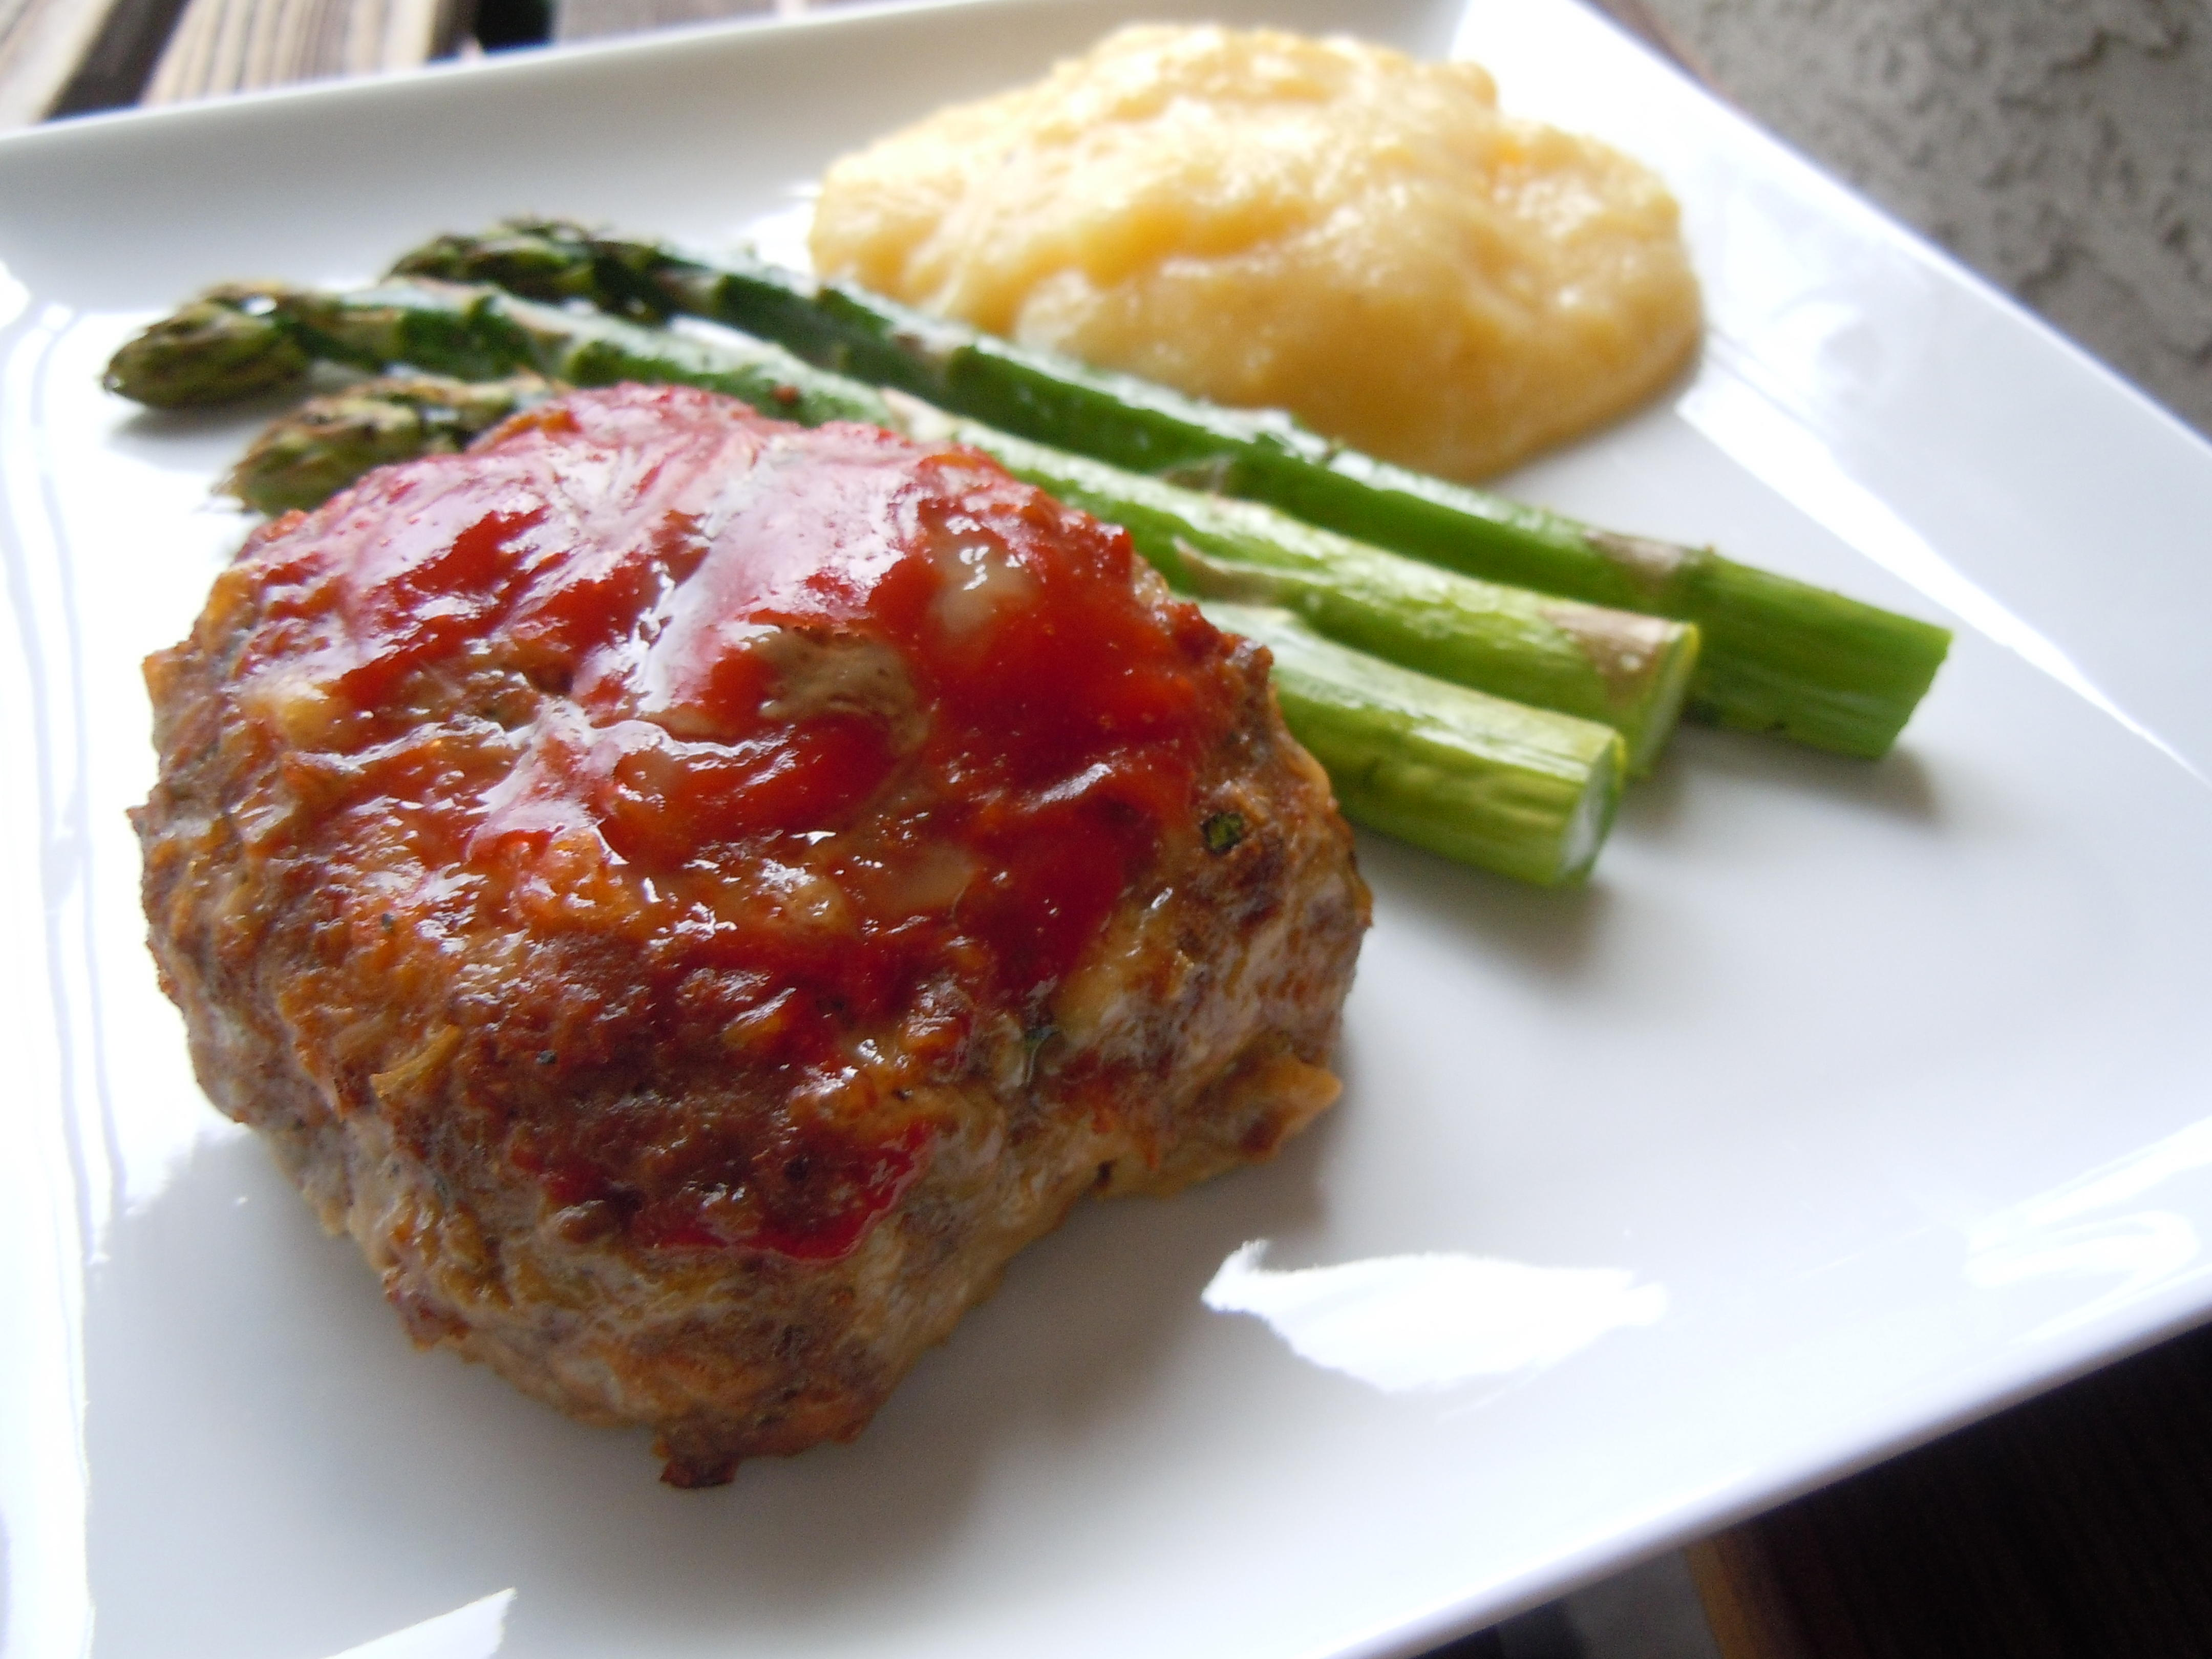 Cheesy Meat Loaf Minis Weight Watchers PointsPlus 7 » Nutmeg Notebook